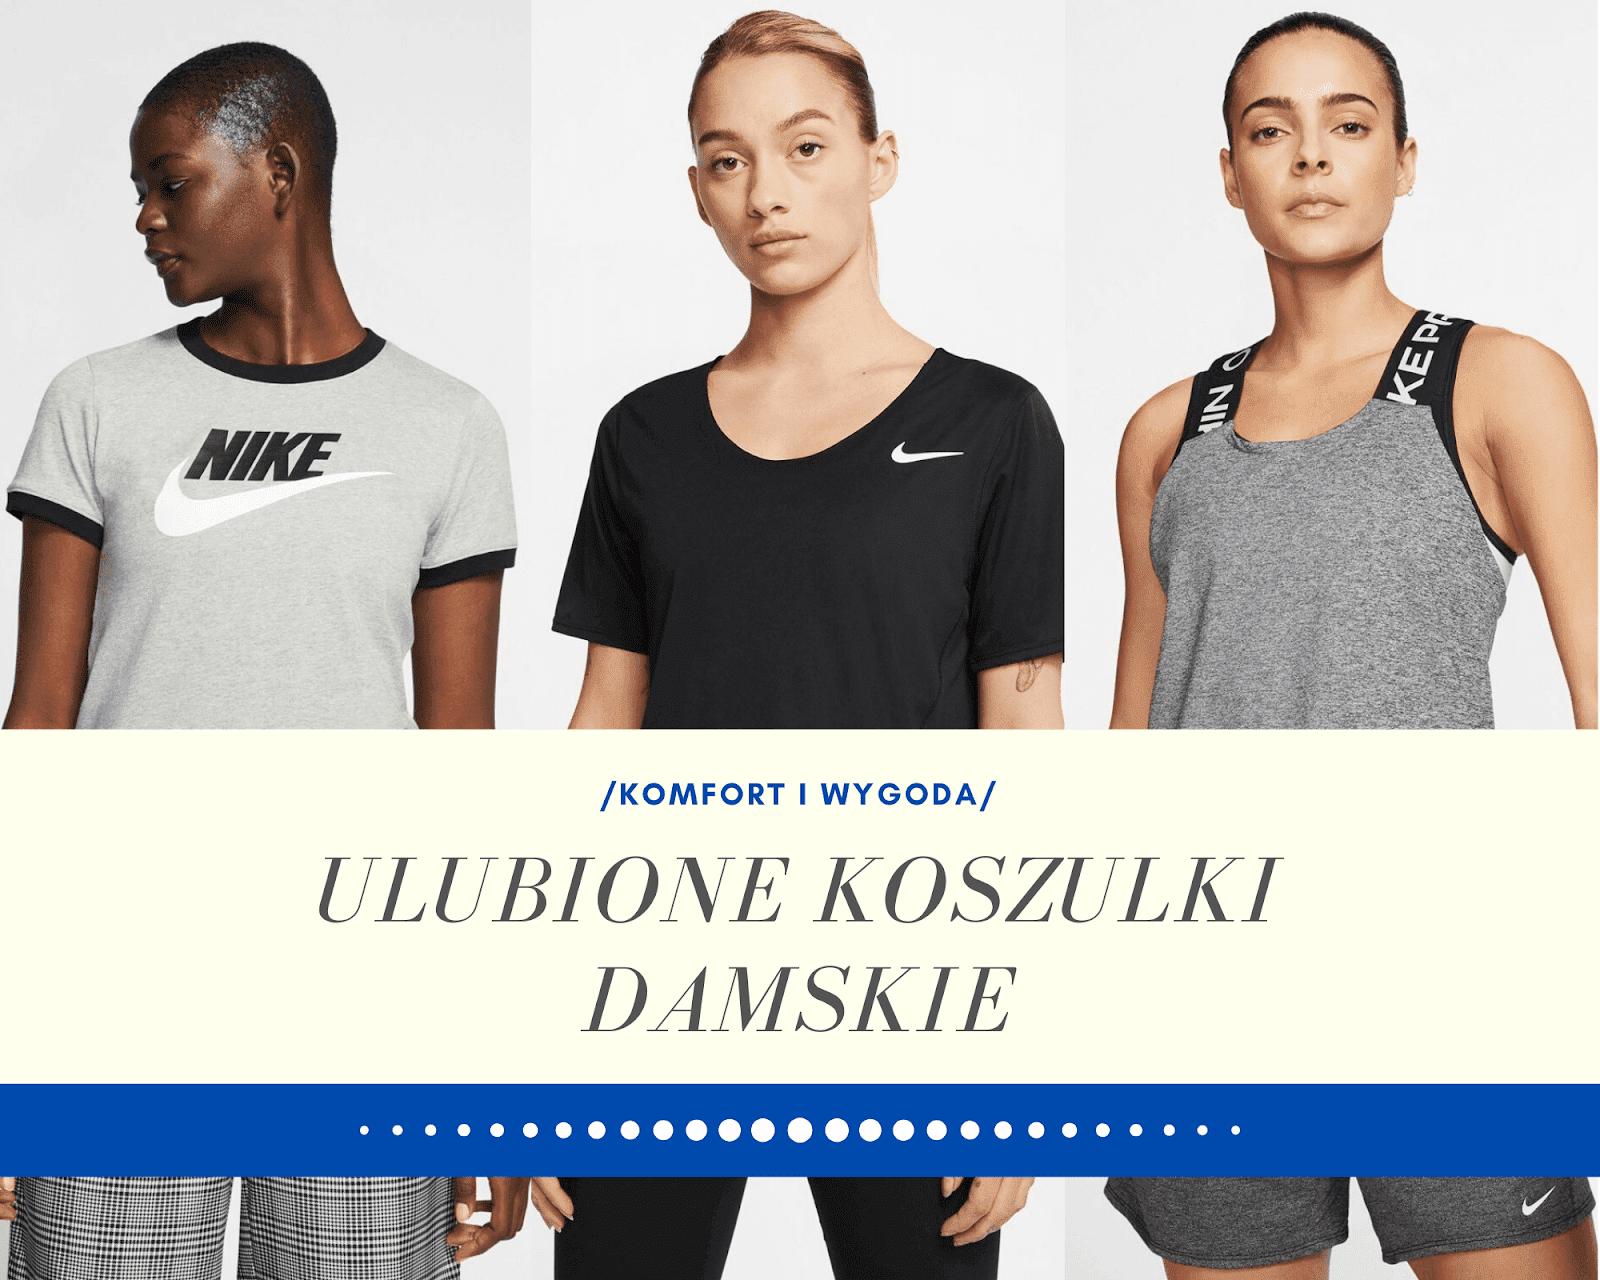 ulubione-koszulki-damskie.png